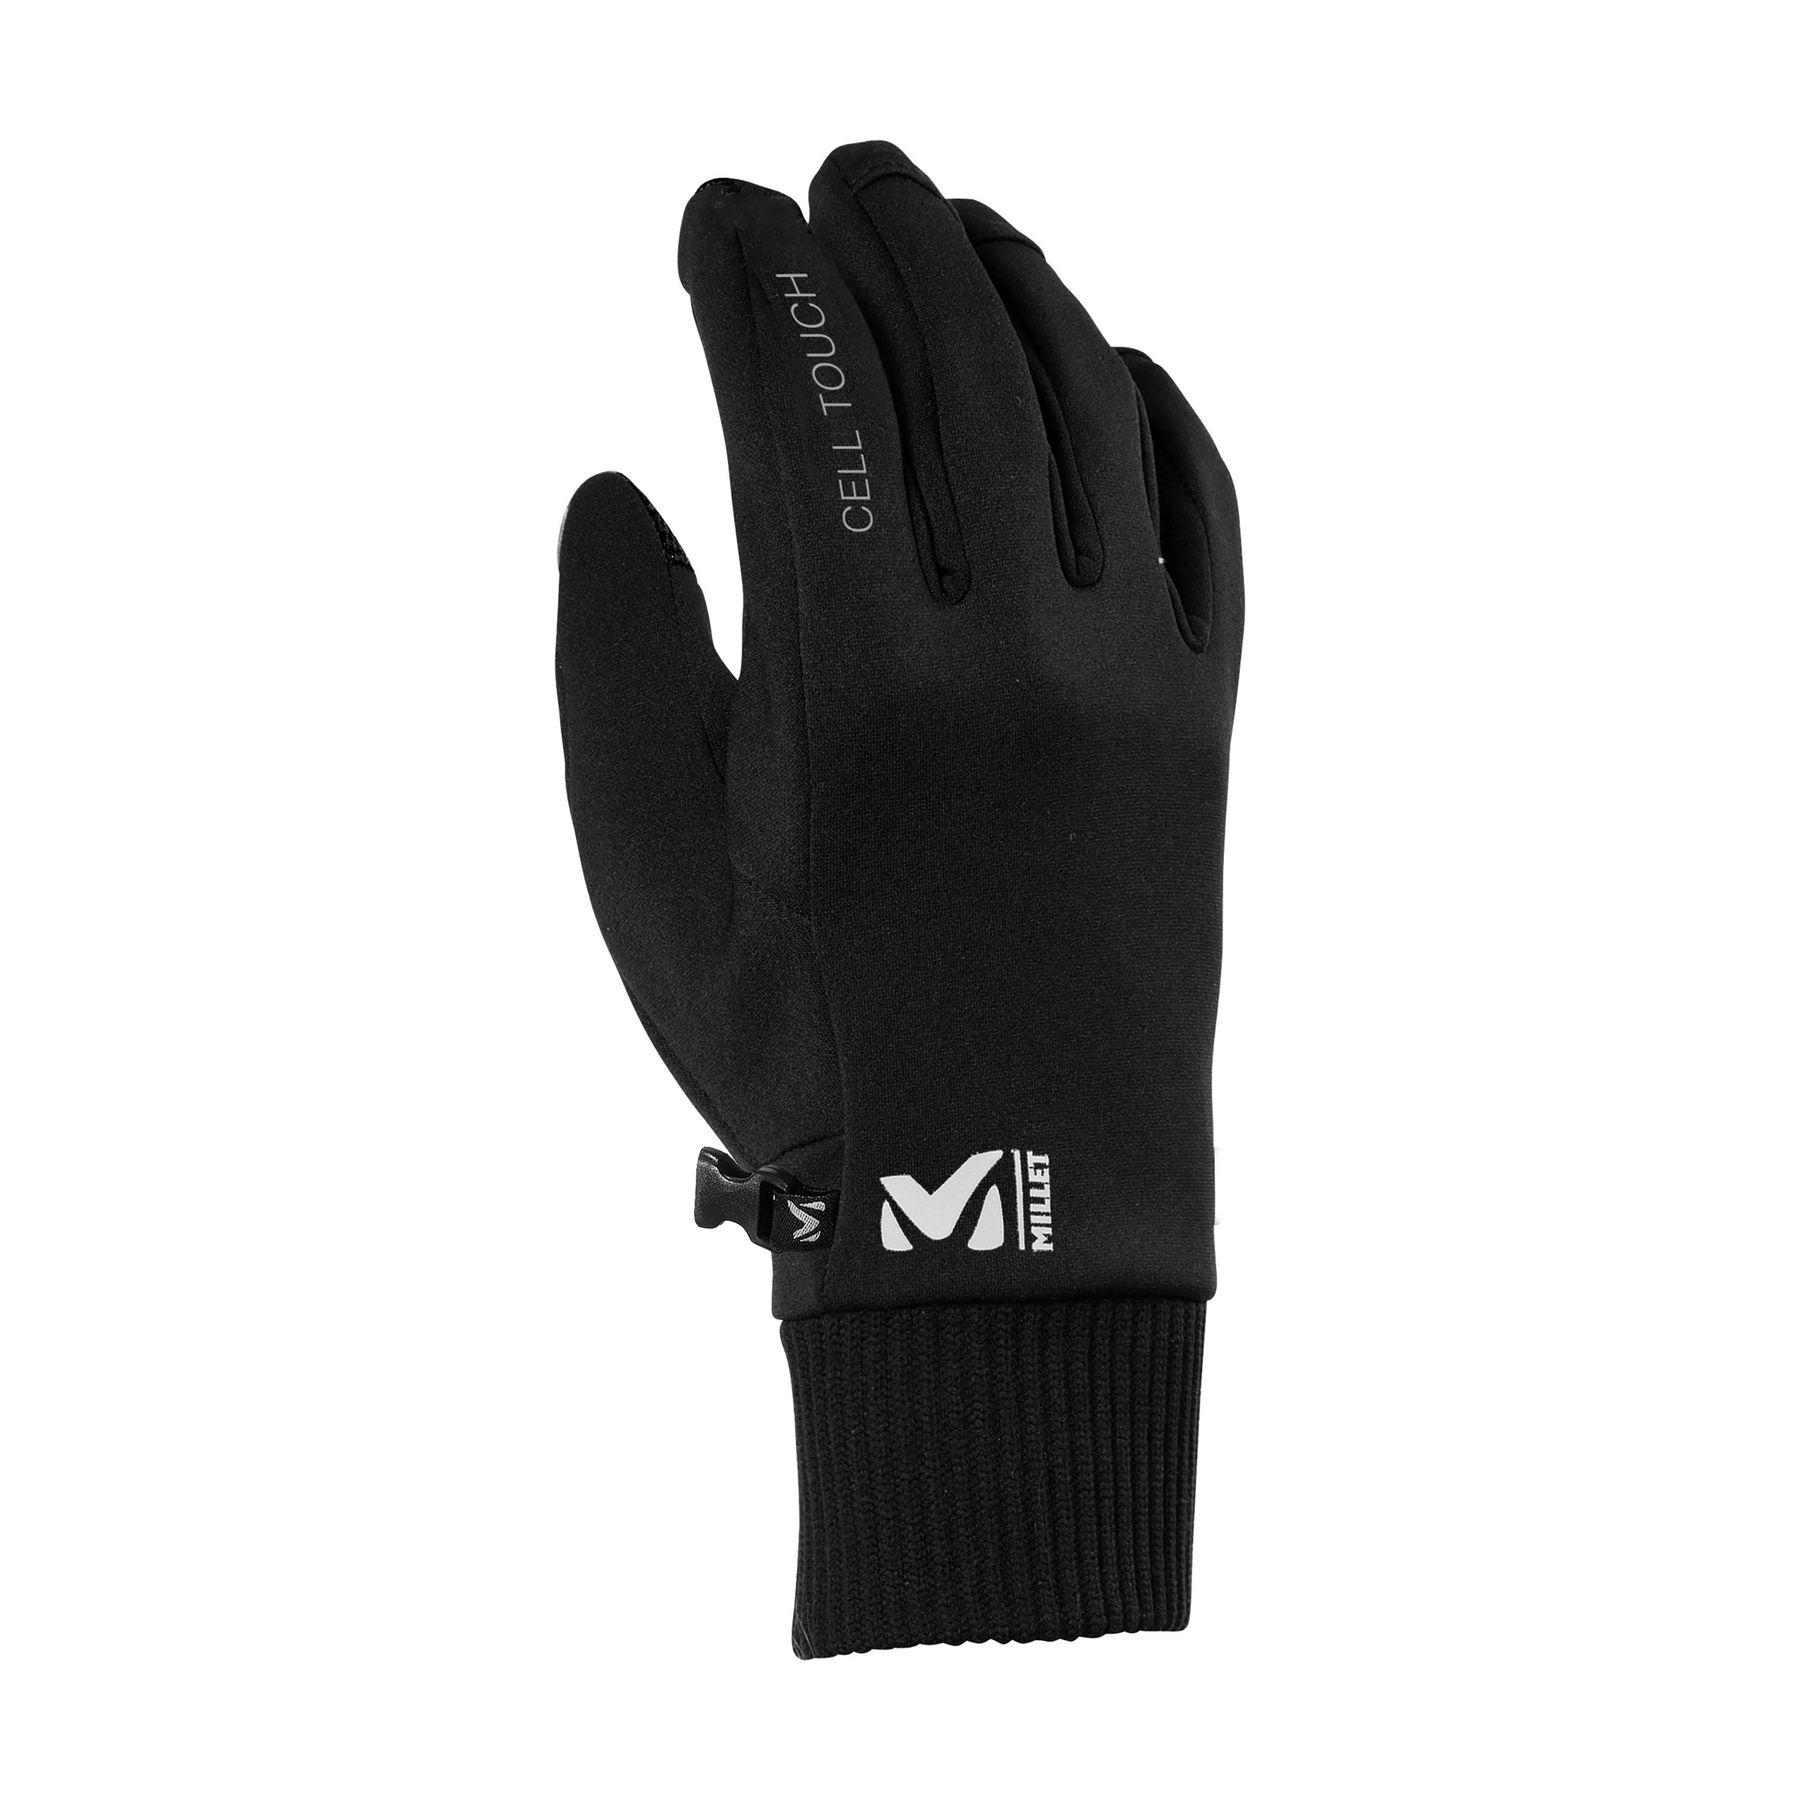 Millet Cell Touch Glove - Gants randonnée